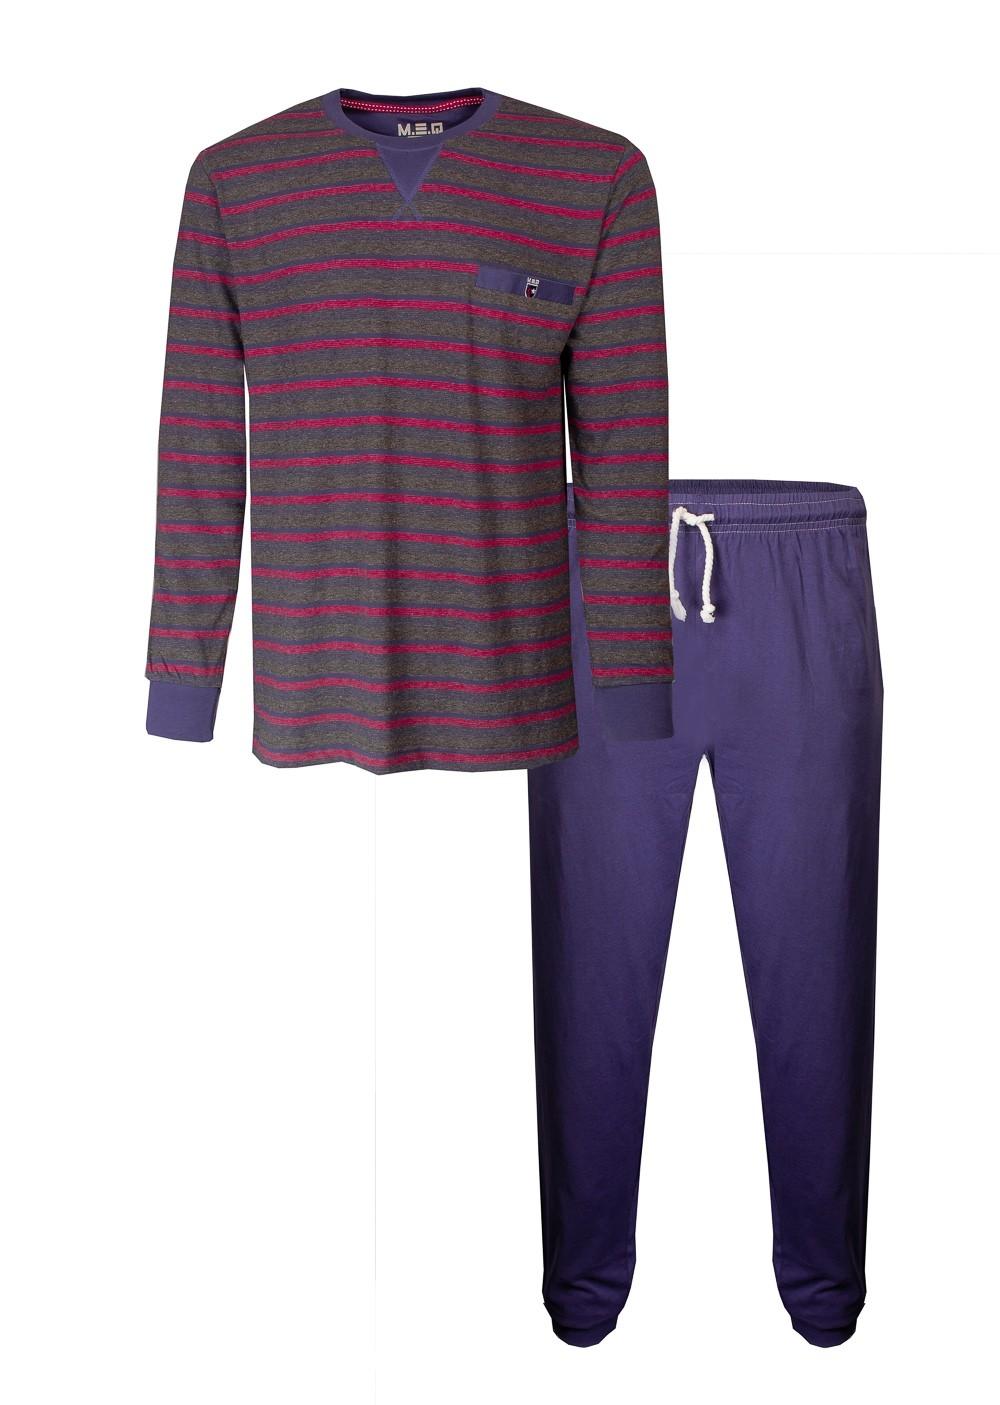 Heren pyjama MEPYH1904A-L/52